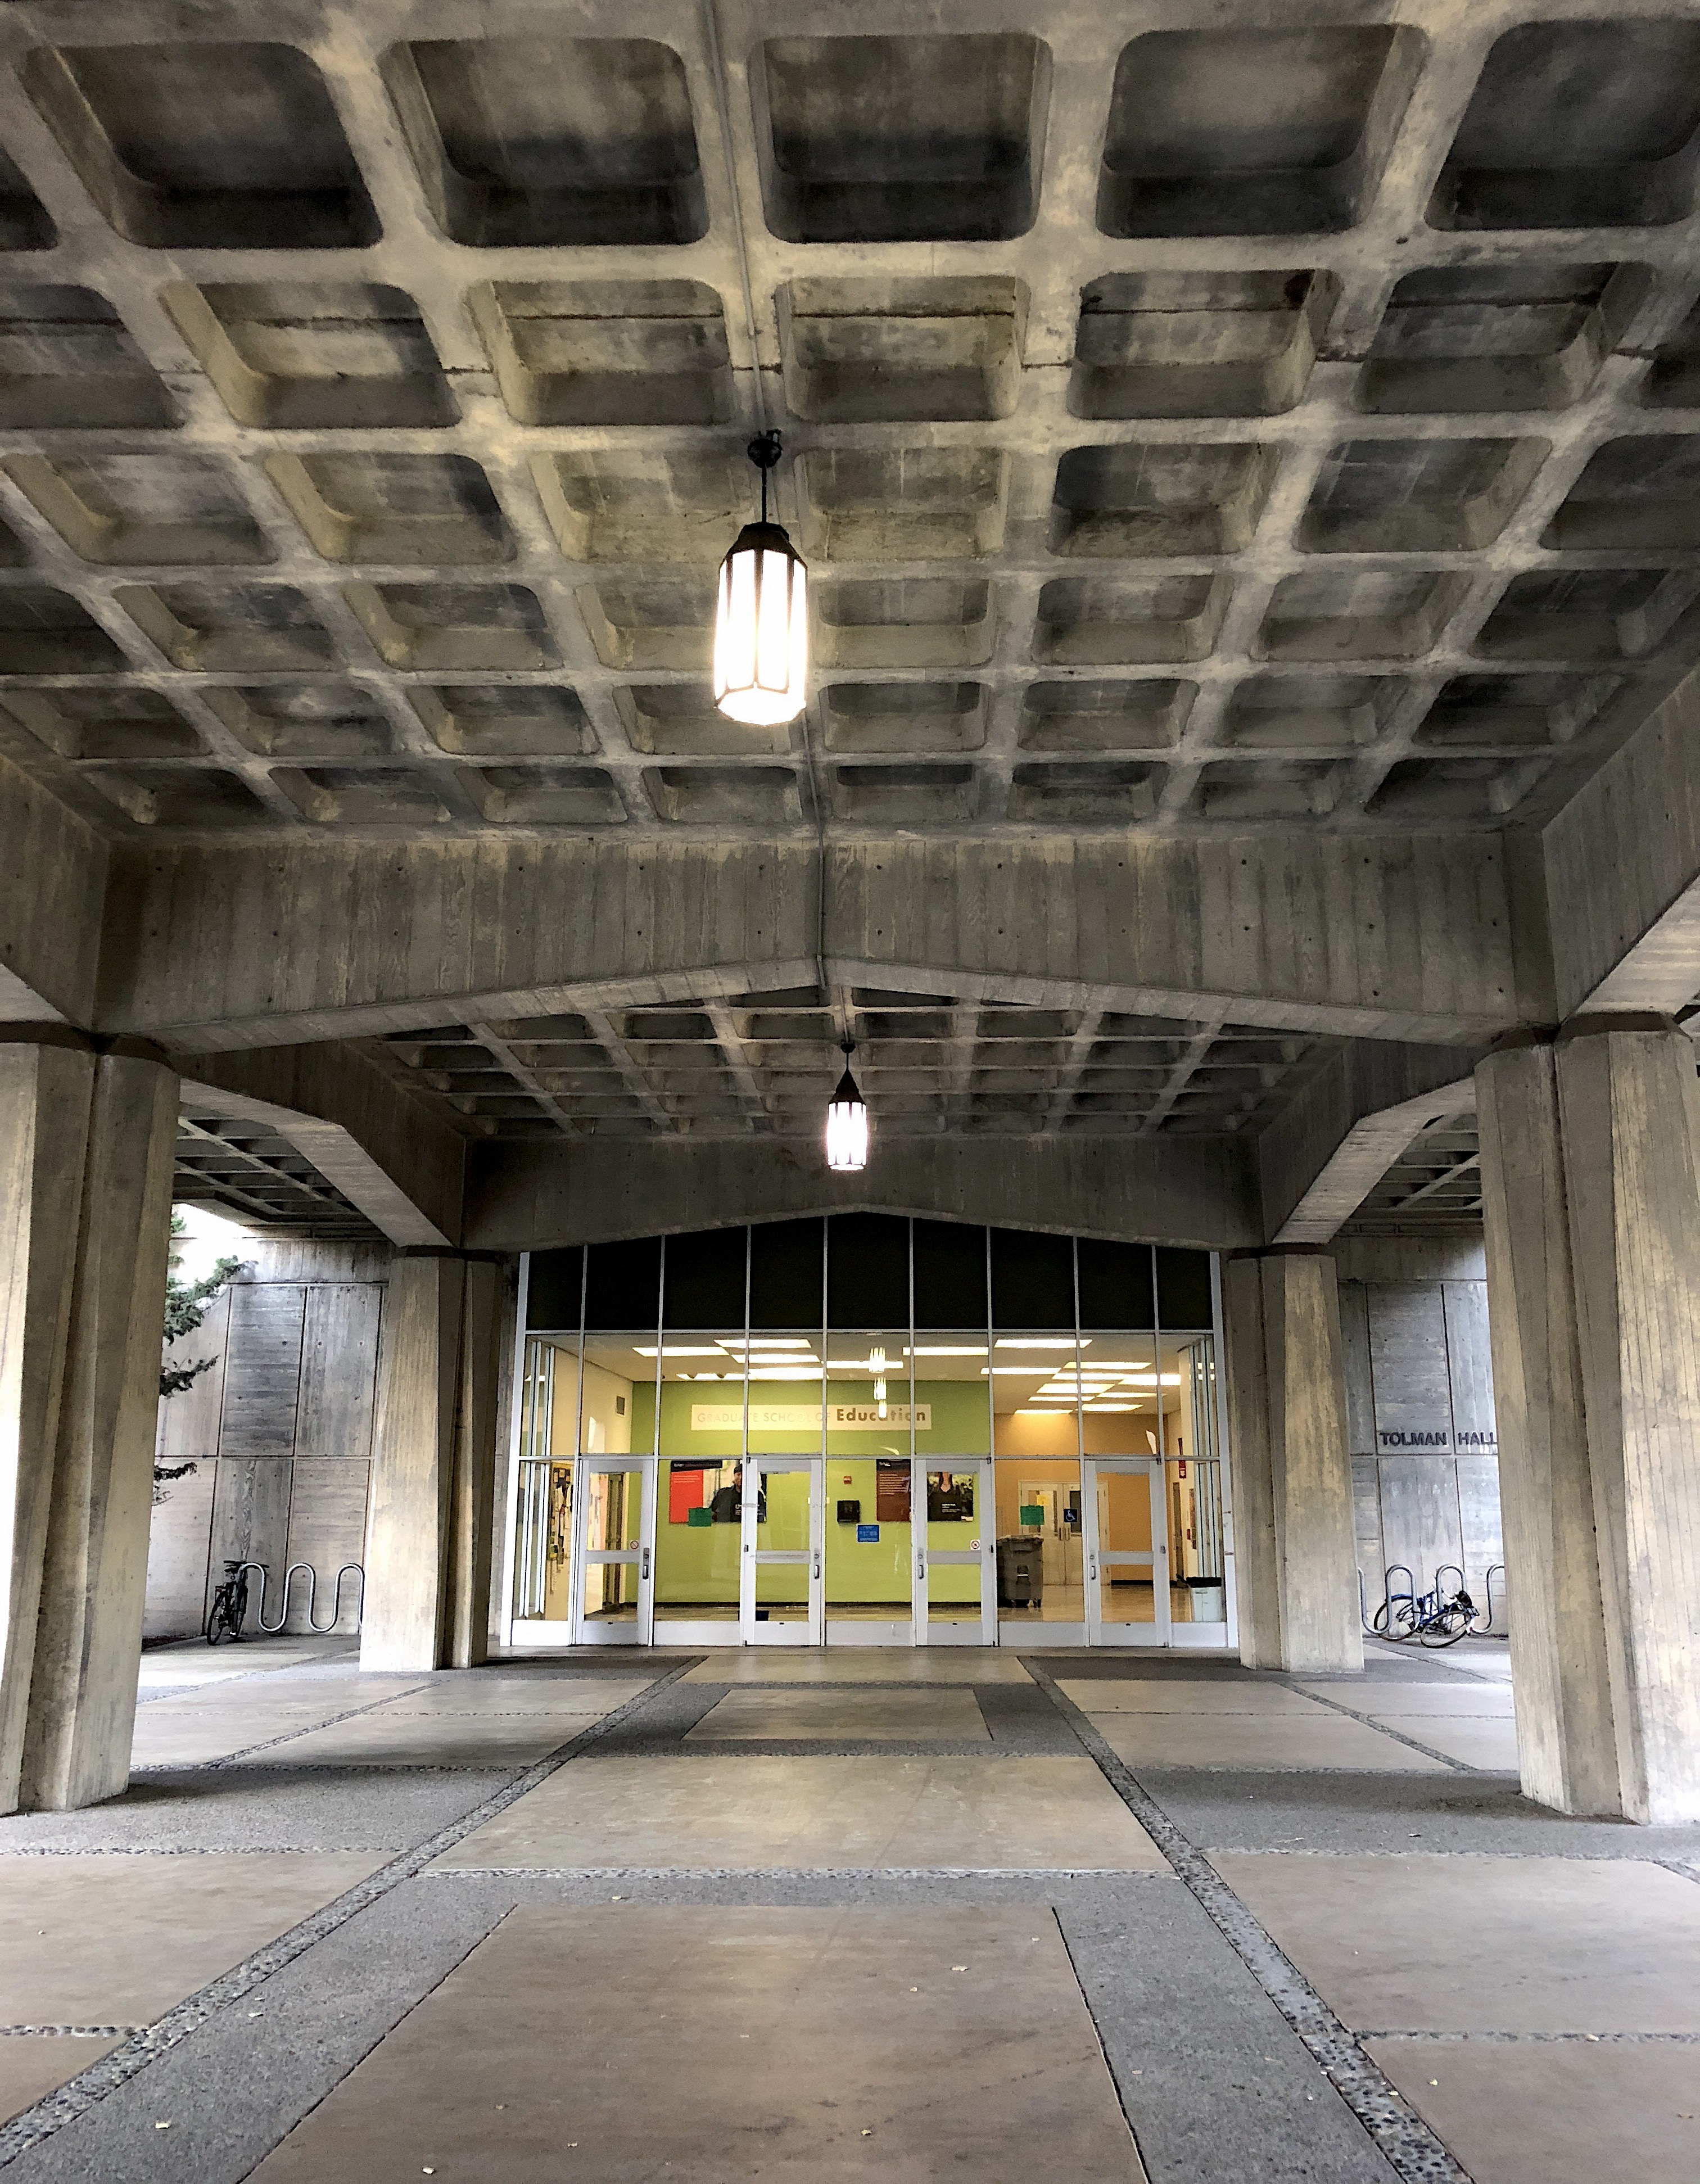 UC Berkeley set to demolish brutalist gem - Curbed SF on uc berkeley hill, uc berkeley fox, uc berkeley evans, uc berkeley tiffany,